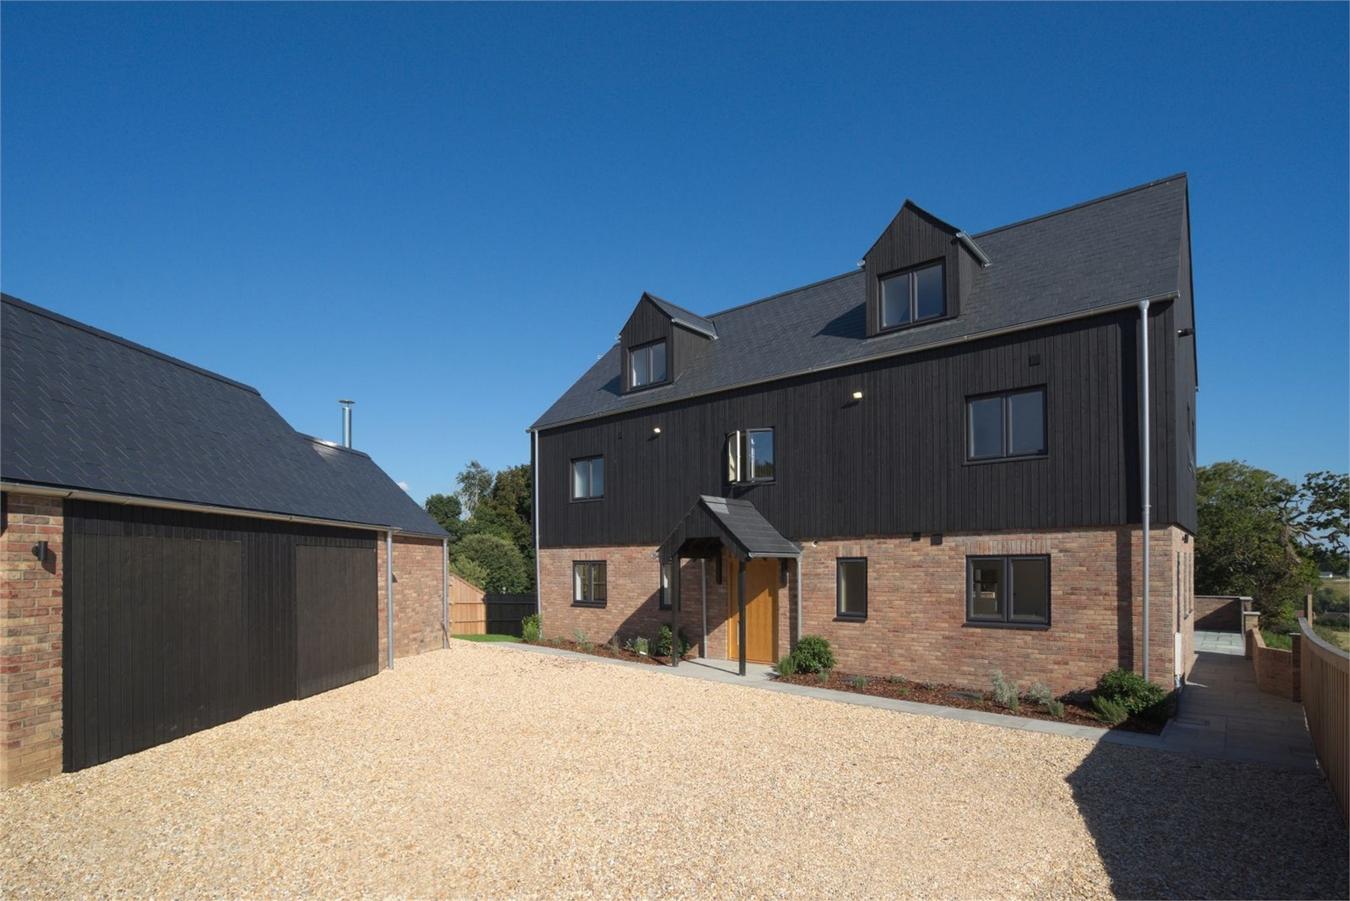 5 Bedroom Detached House For Sale In Wimborne